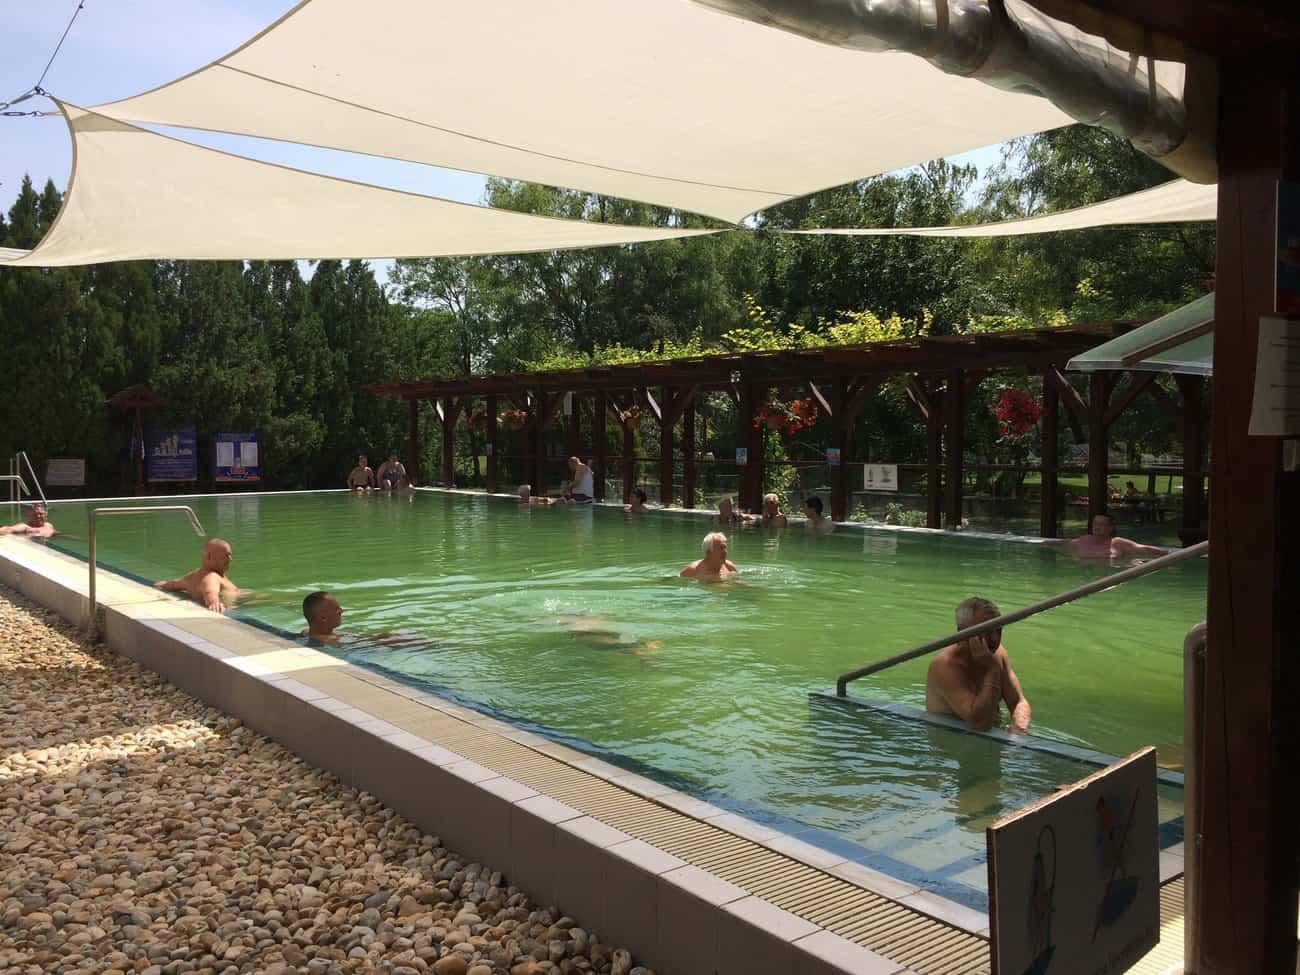 Hungary Lipót Thermal Bath and Spa Thermal Pool